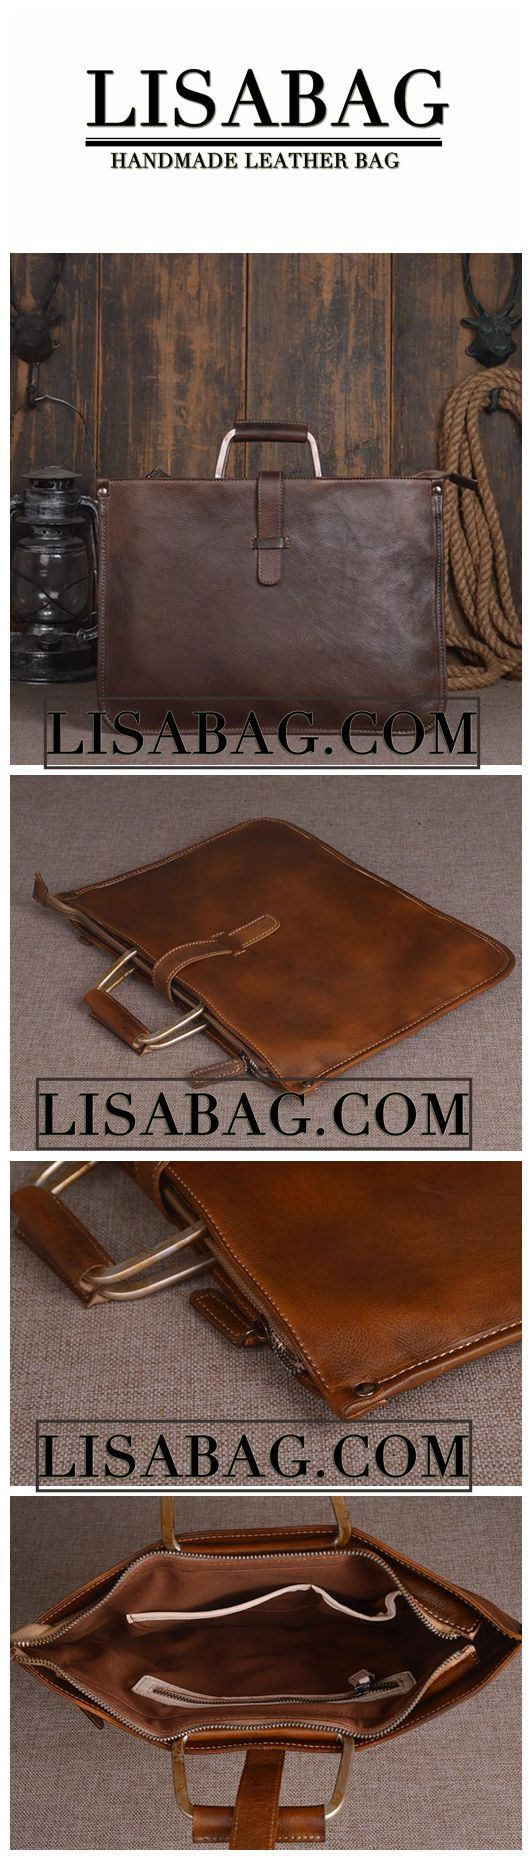 Handmade Vintage Leather Briefcase Men's Business Handbag Laptop Bag in Dark Brown 14131